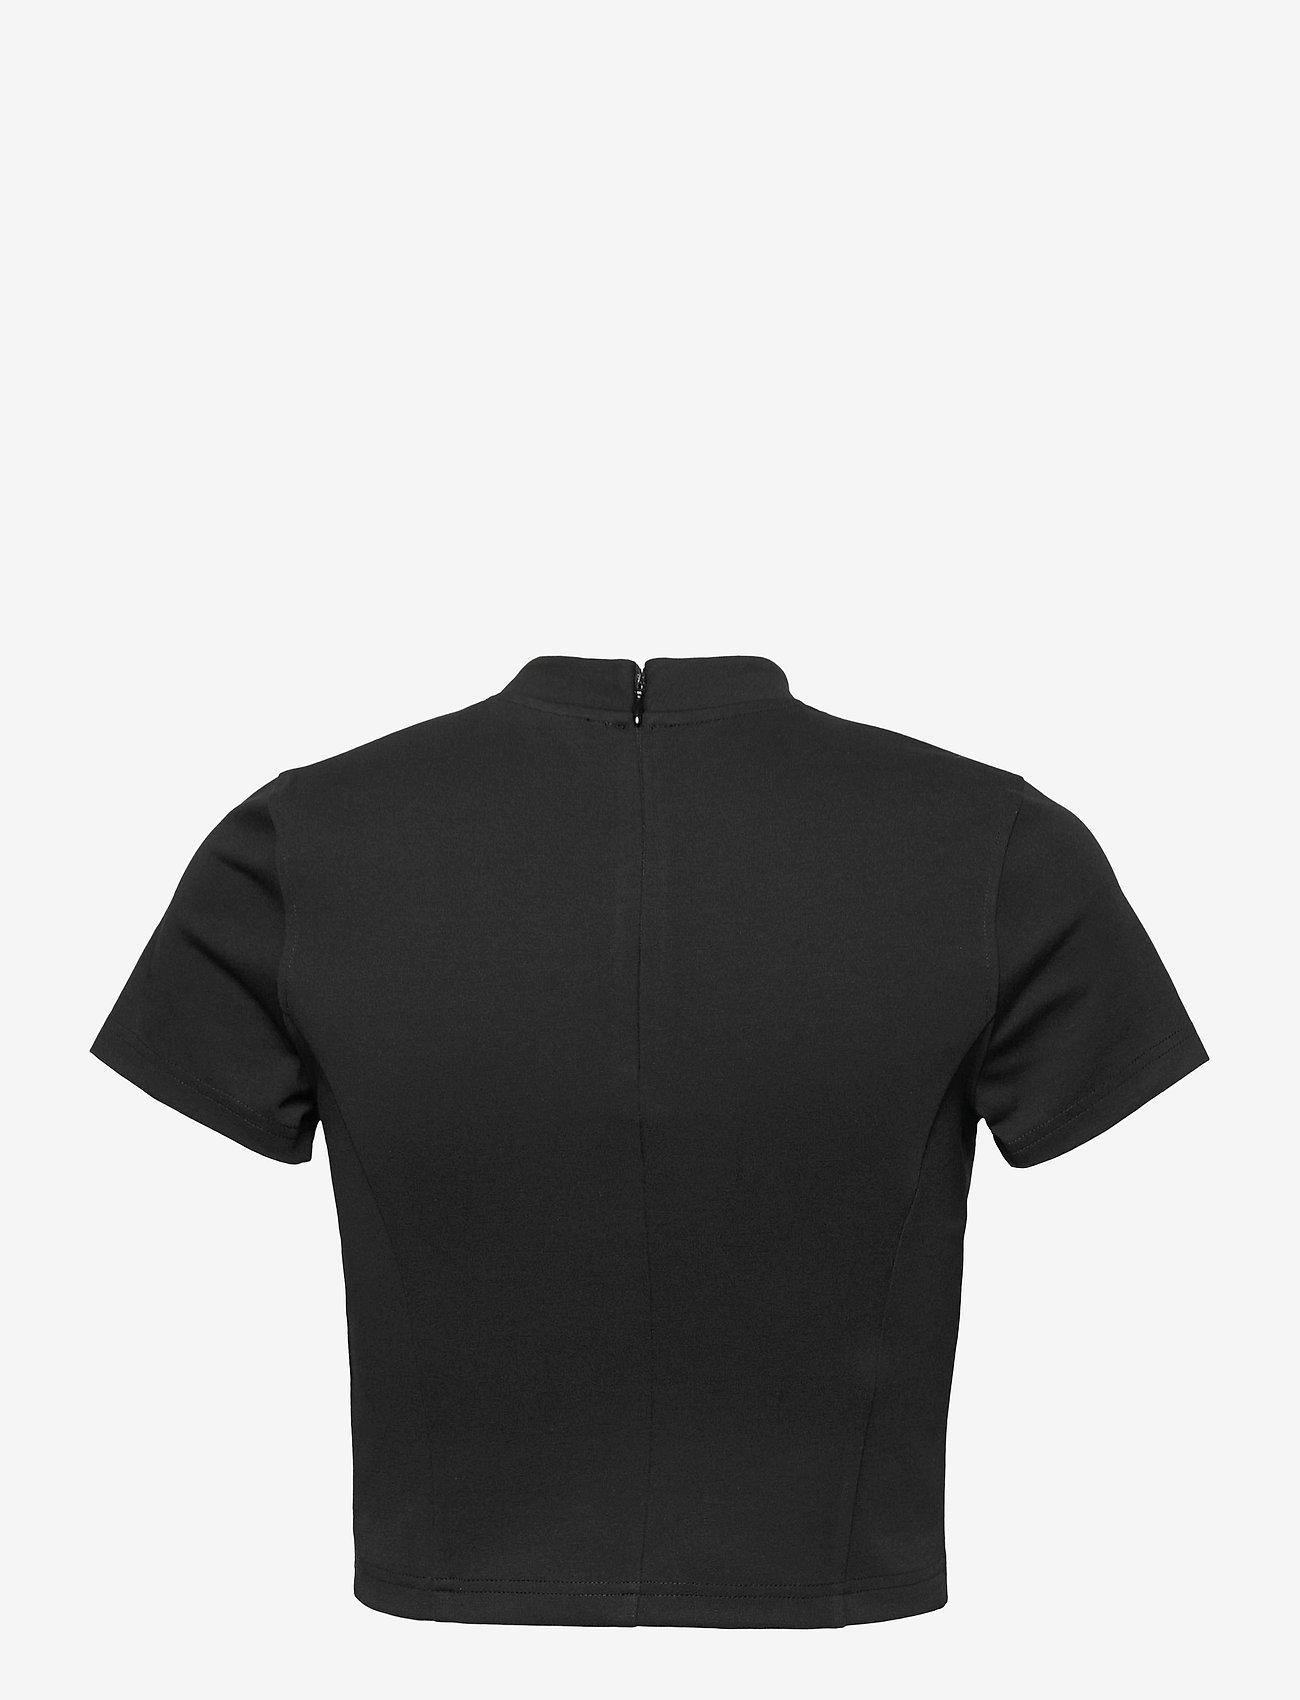 Calvin Klein Jeans - MILANO CENTER INSTITUTIONAL SS - crop tops - ck black - 1